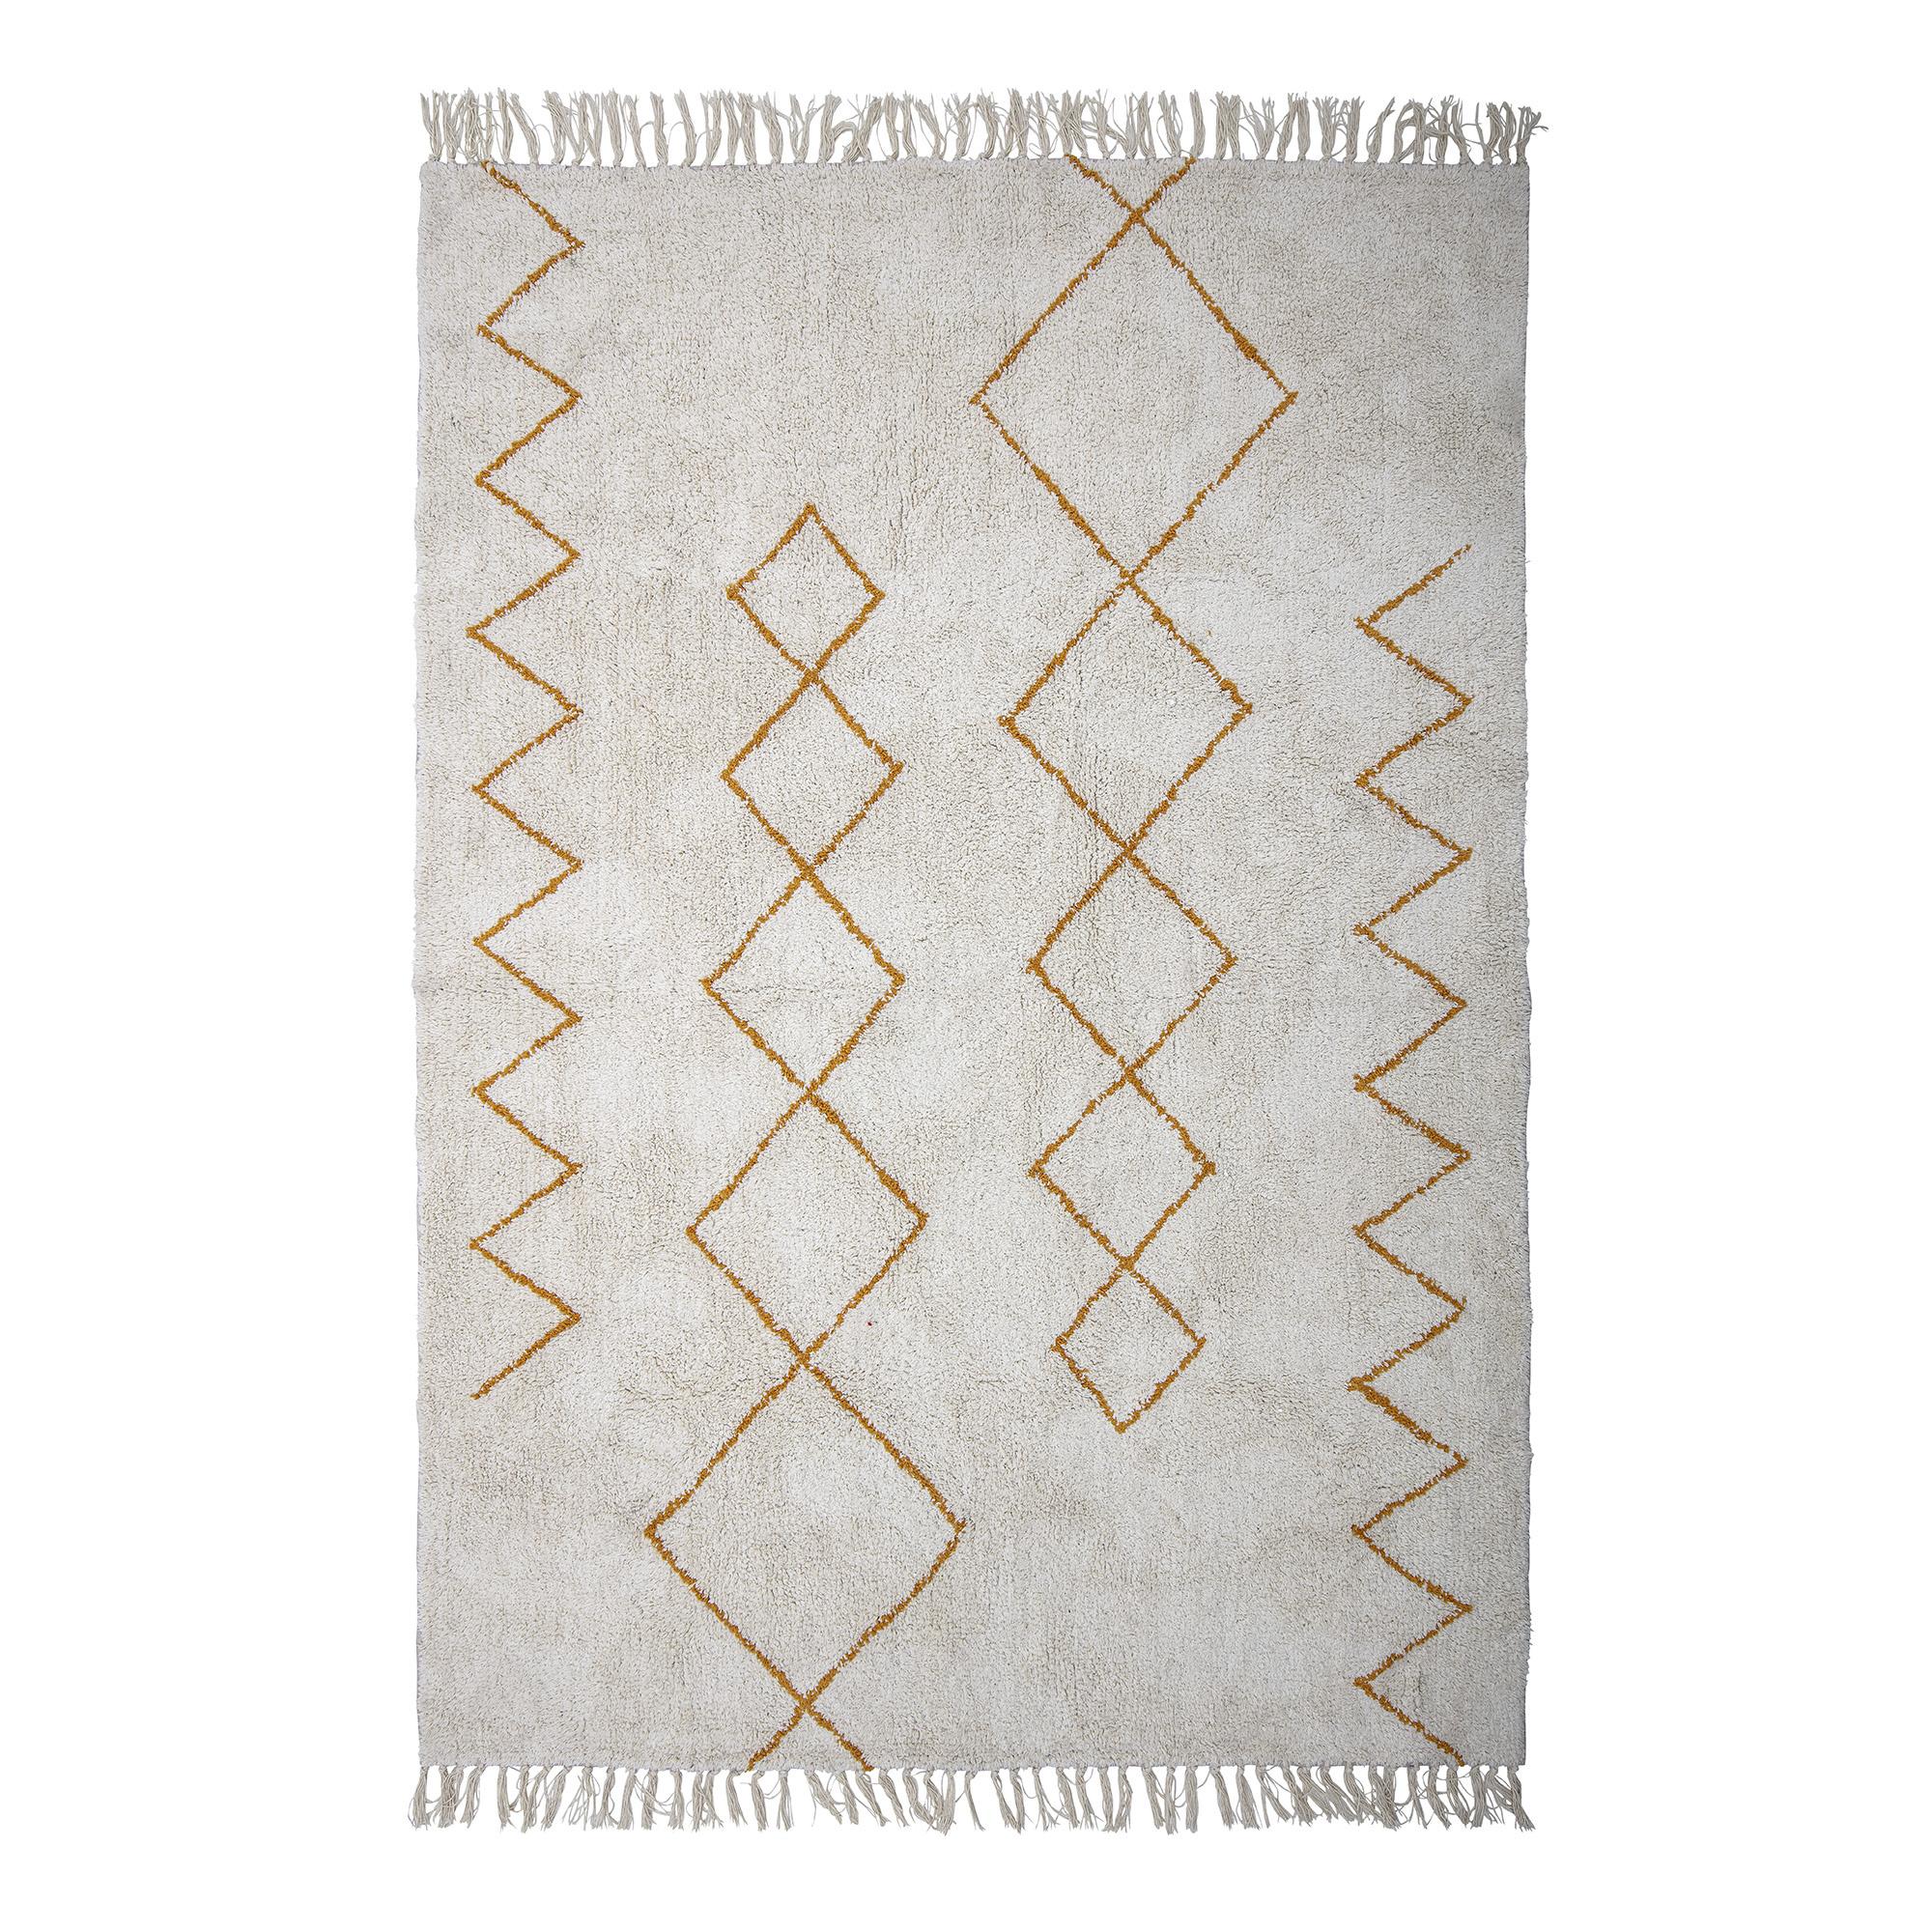 Bloomingville Scandinavian rug Yellow cotton - white - 200x140cm - Bloomingville